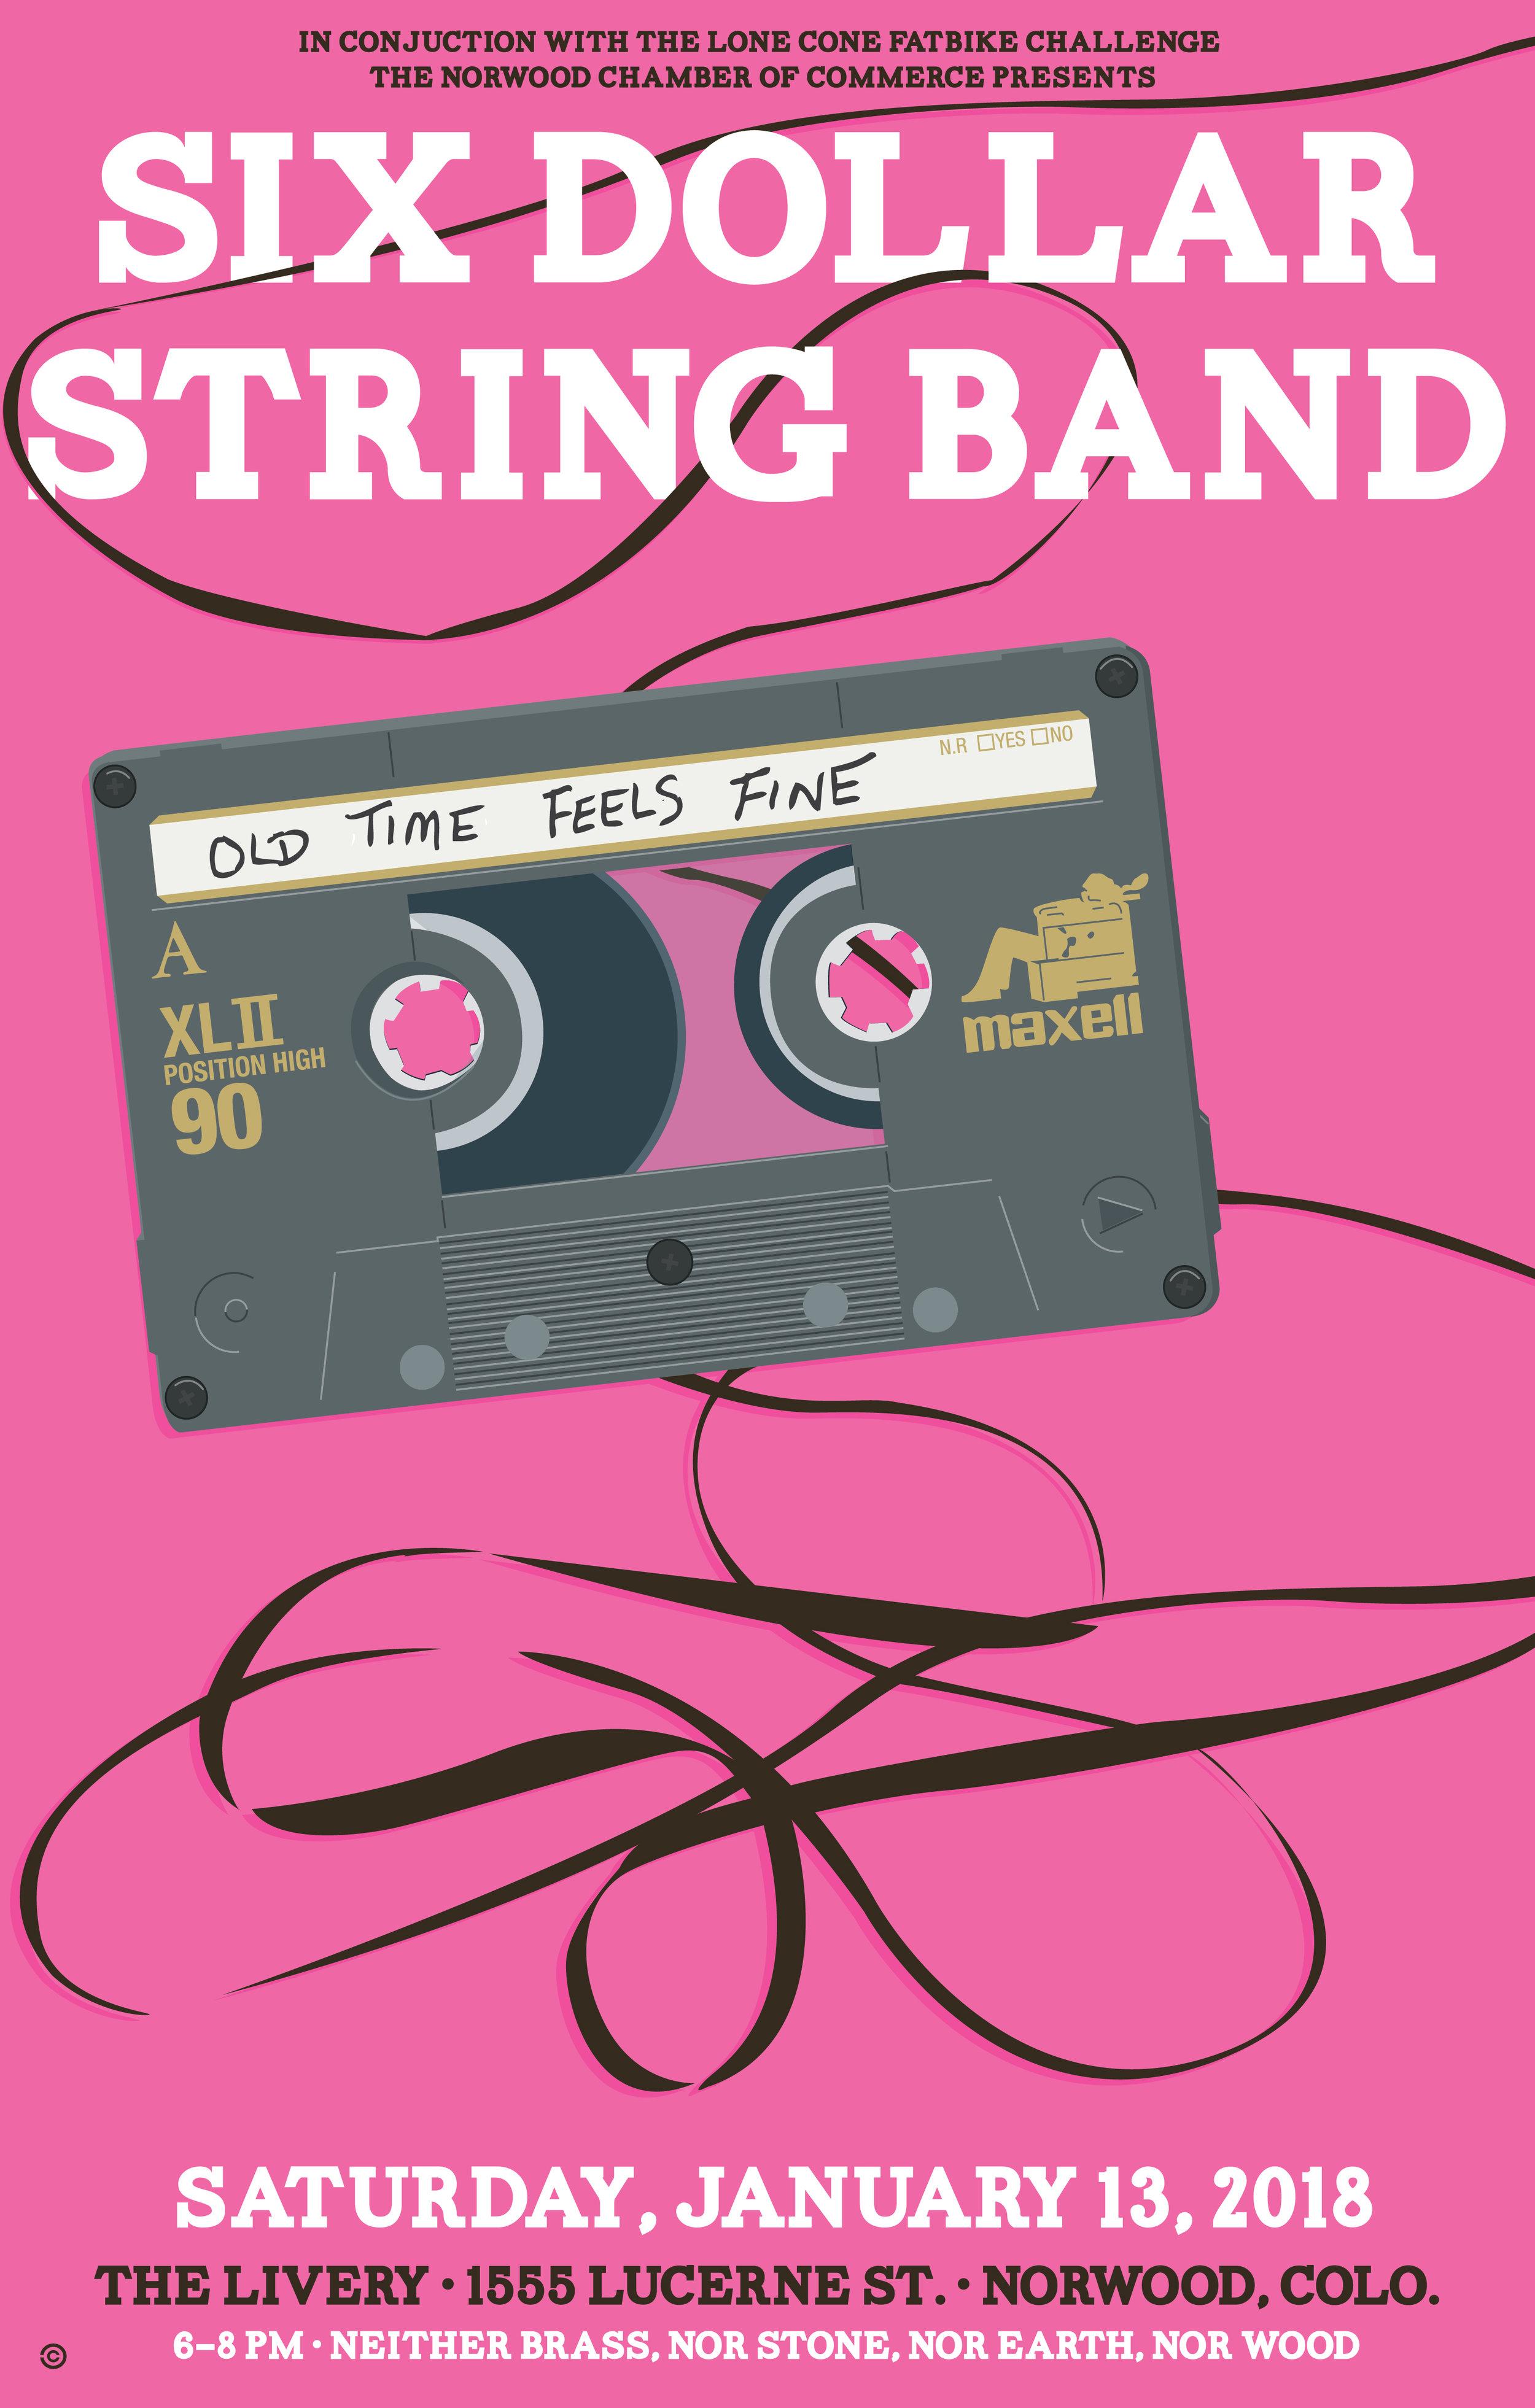 I need a pencil - Six Dollar String Band